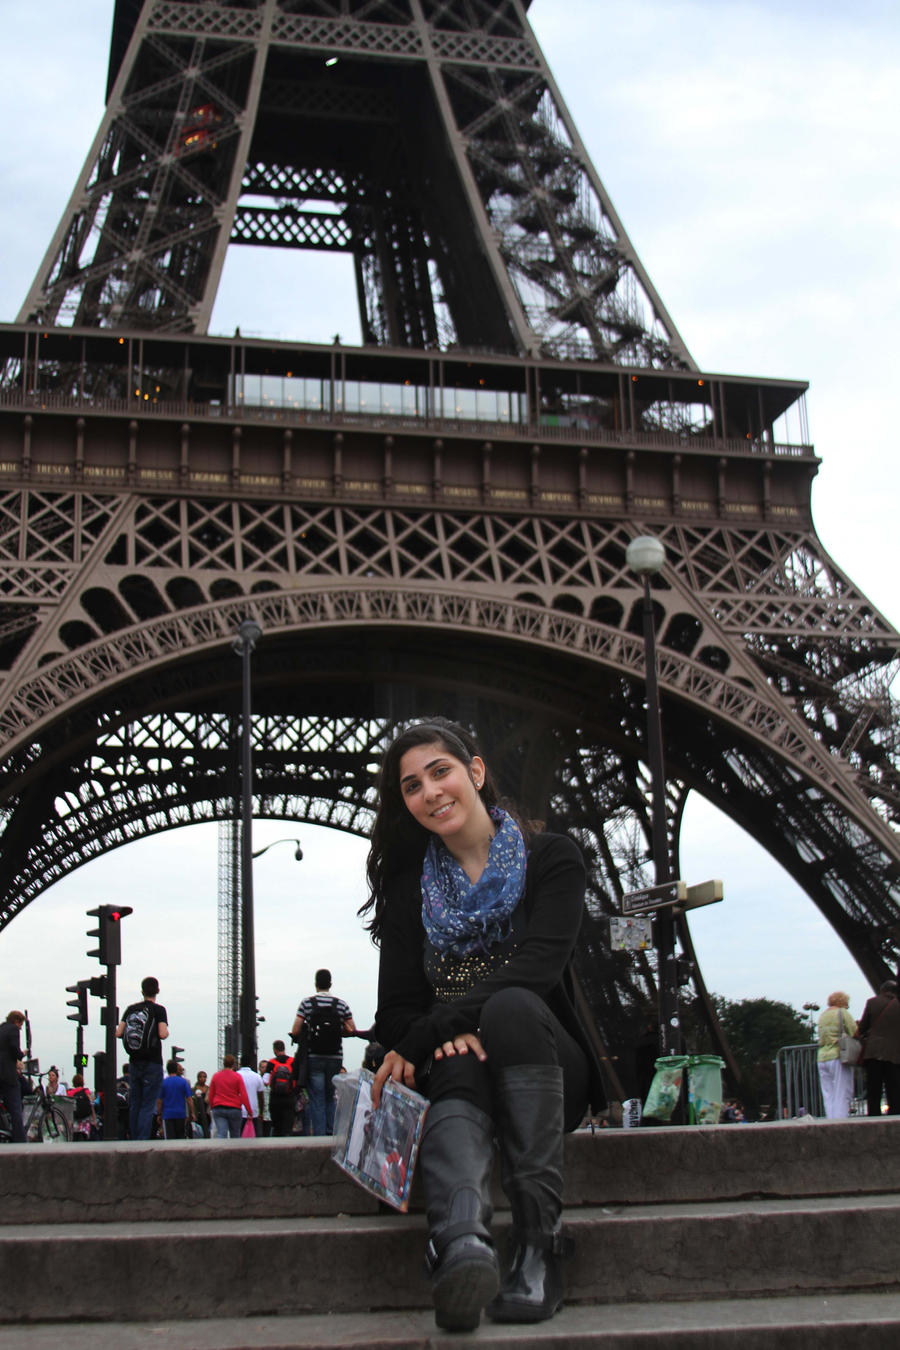 NatalieKhairallah's Profile Picture